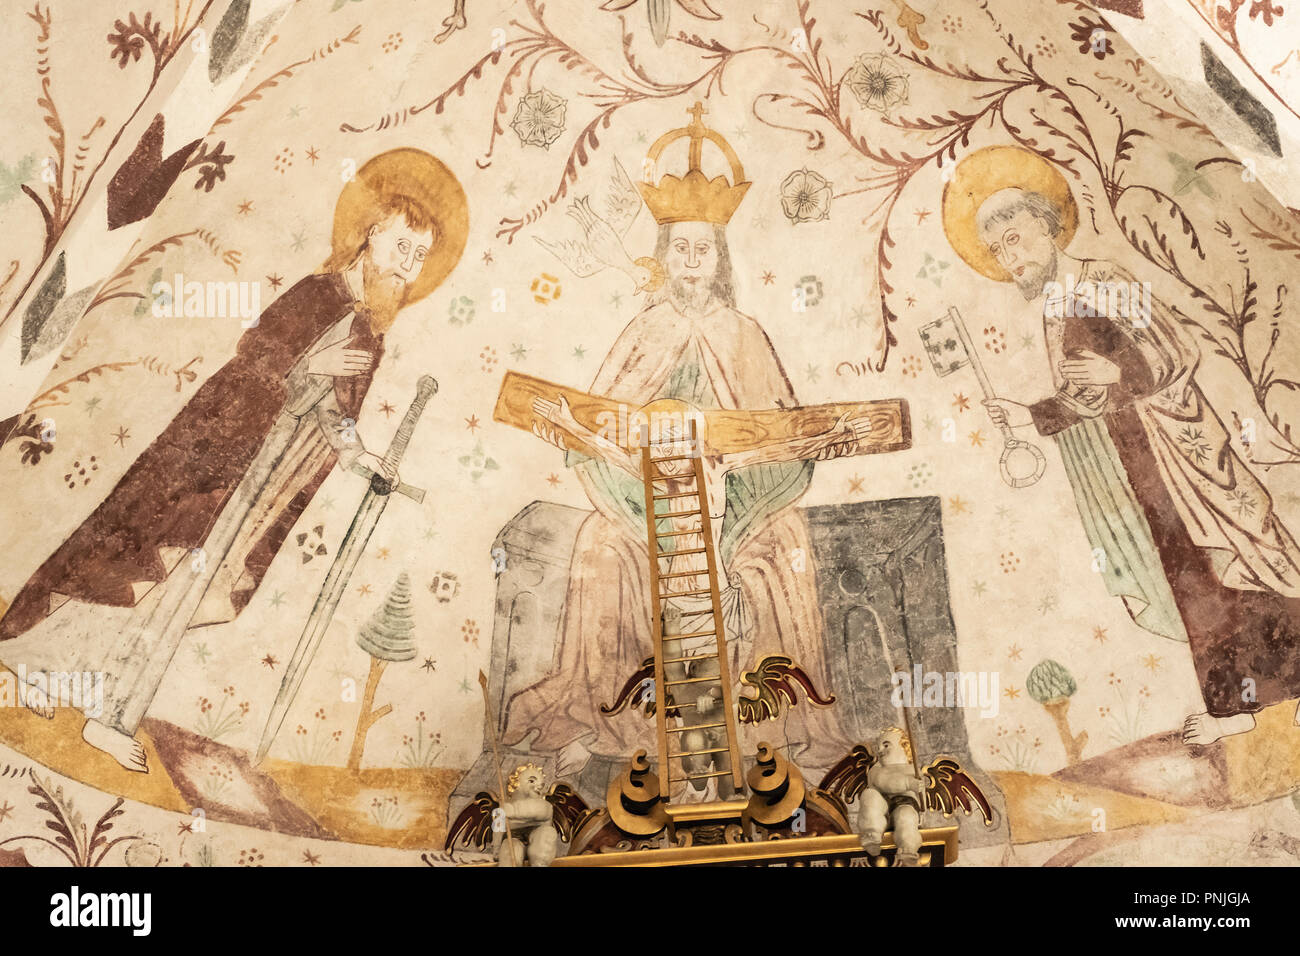 Innenansicht der Kirche Elmelunde mit Wandmalereien von der Elmelunde Master, Moen Island, Dänemark, Skandinavien, Europa. Stockbild